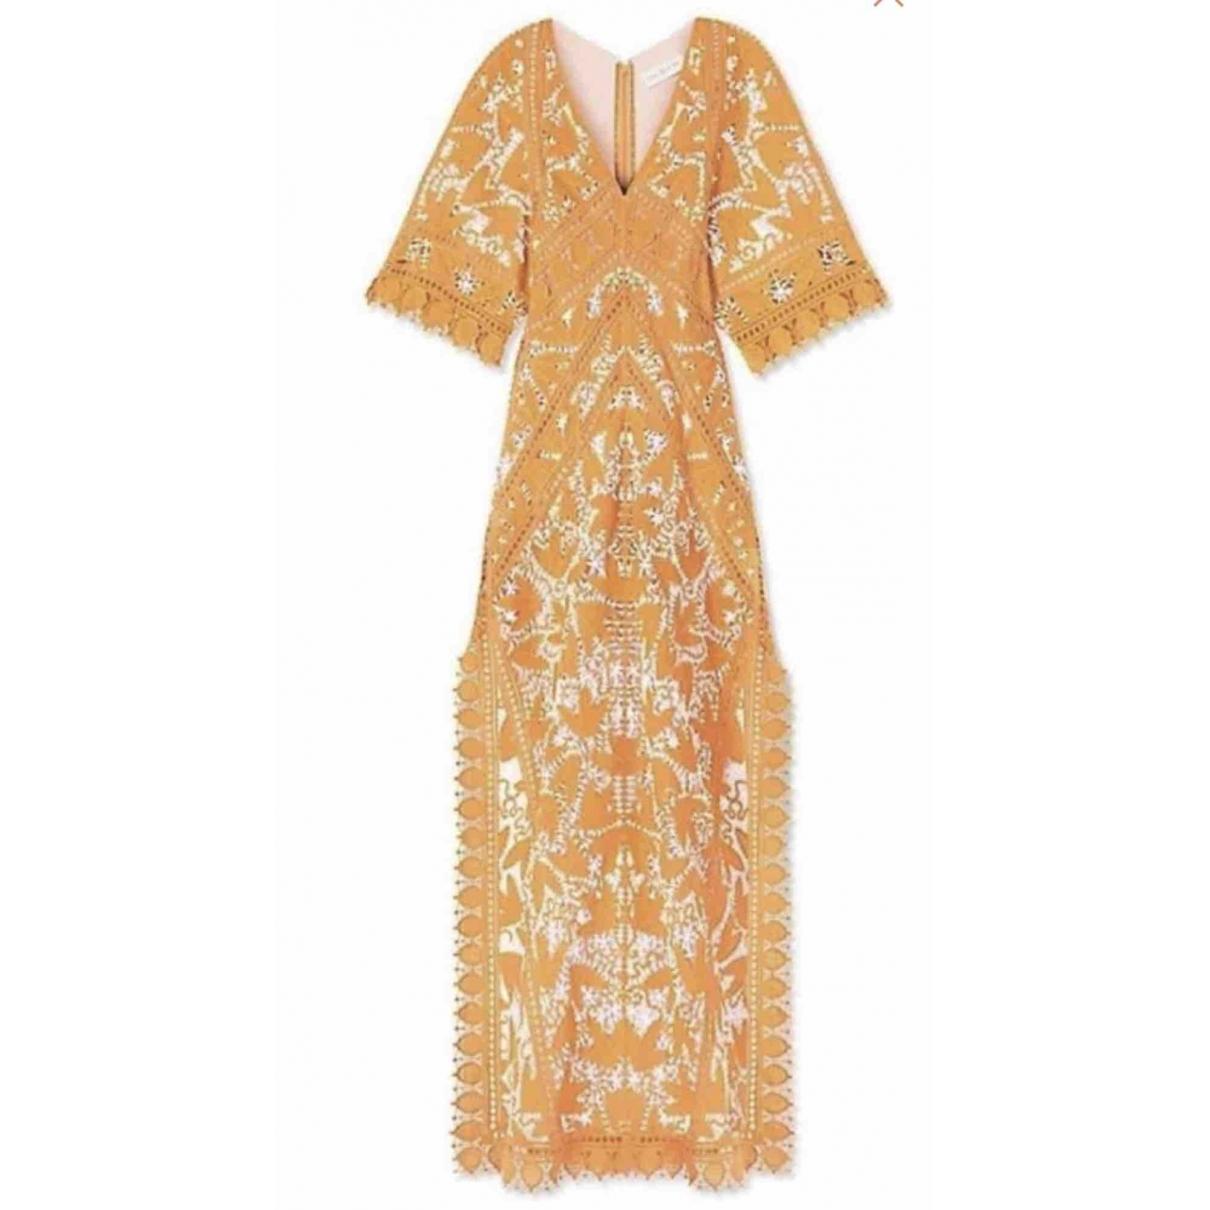 Tory Burch \N Orange Cotton dress for Women 4 US